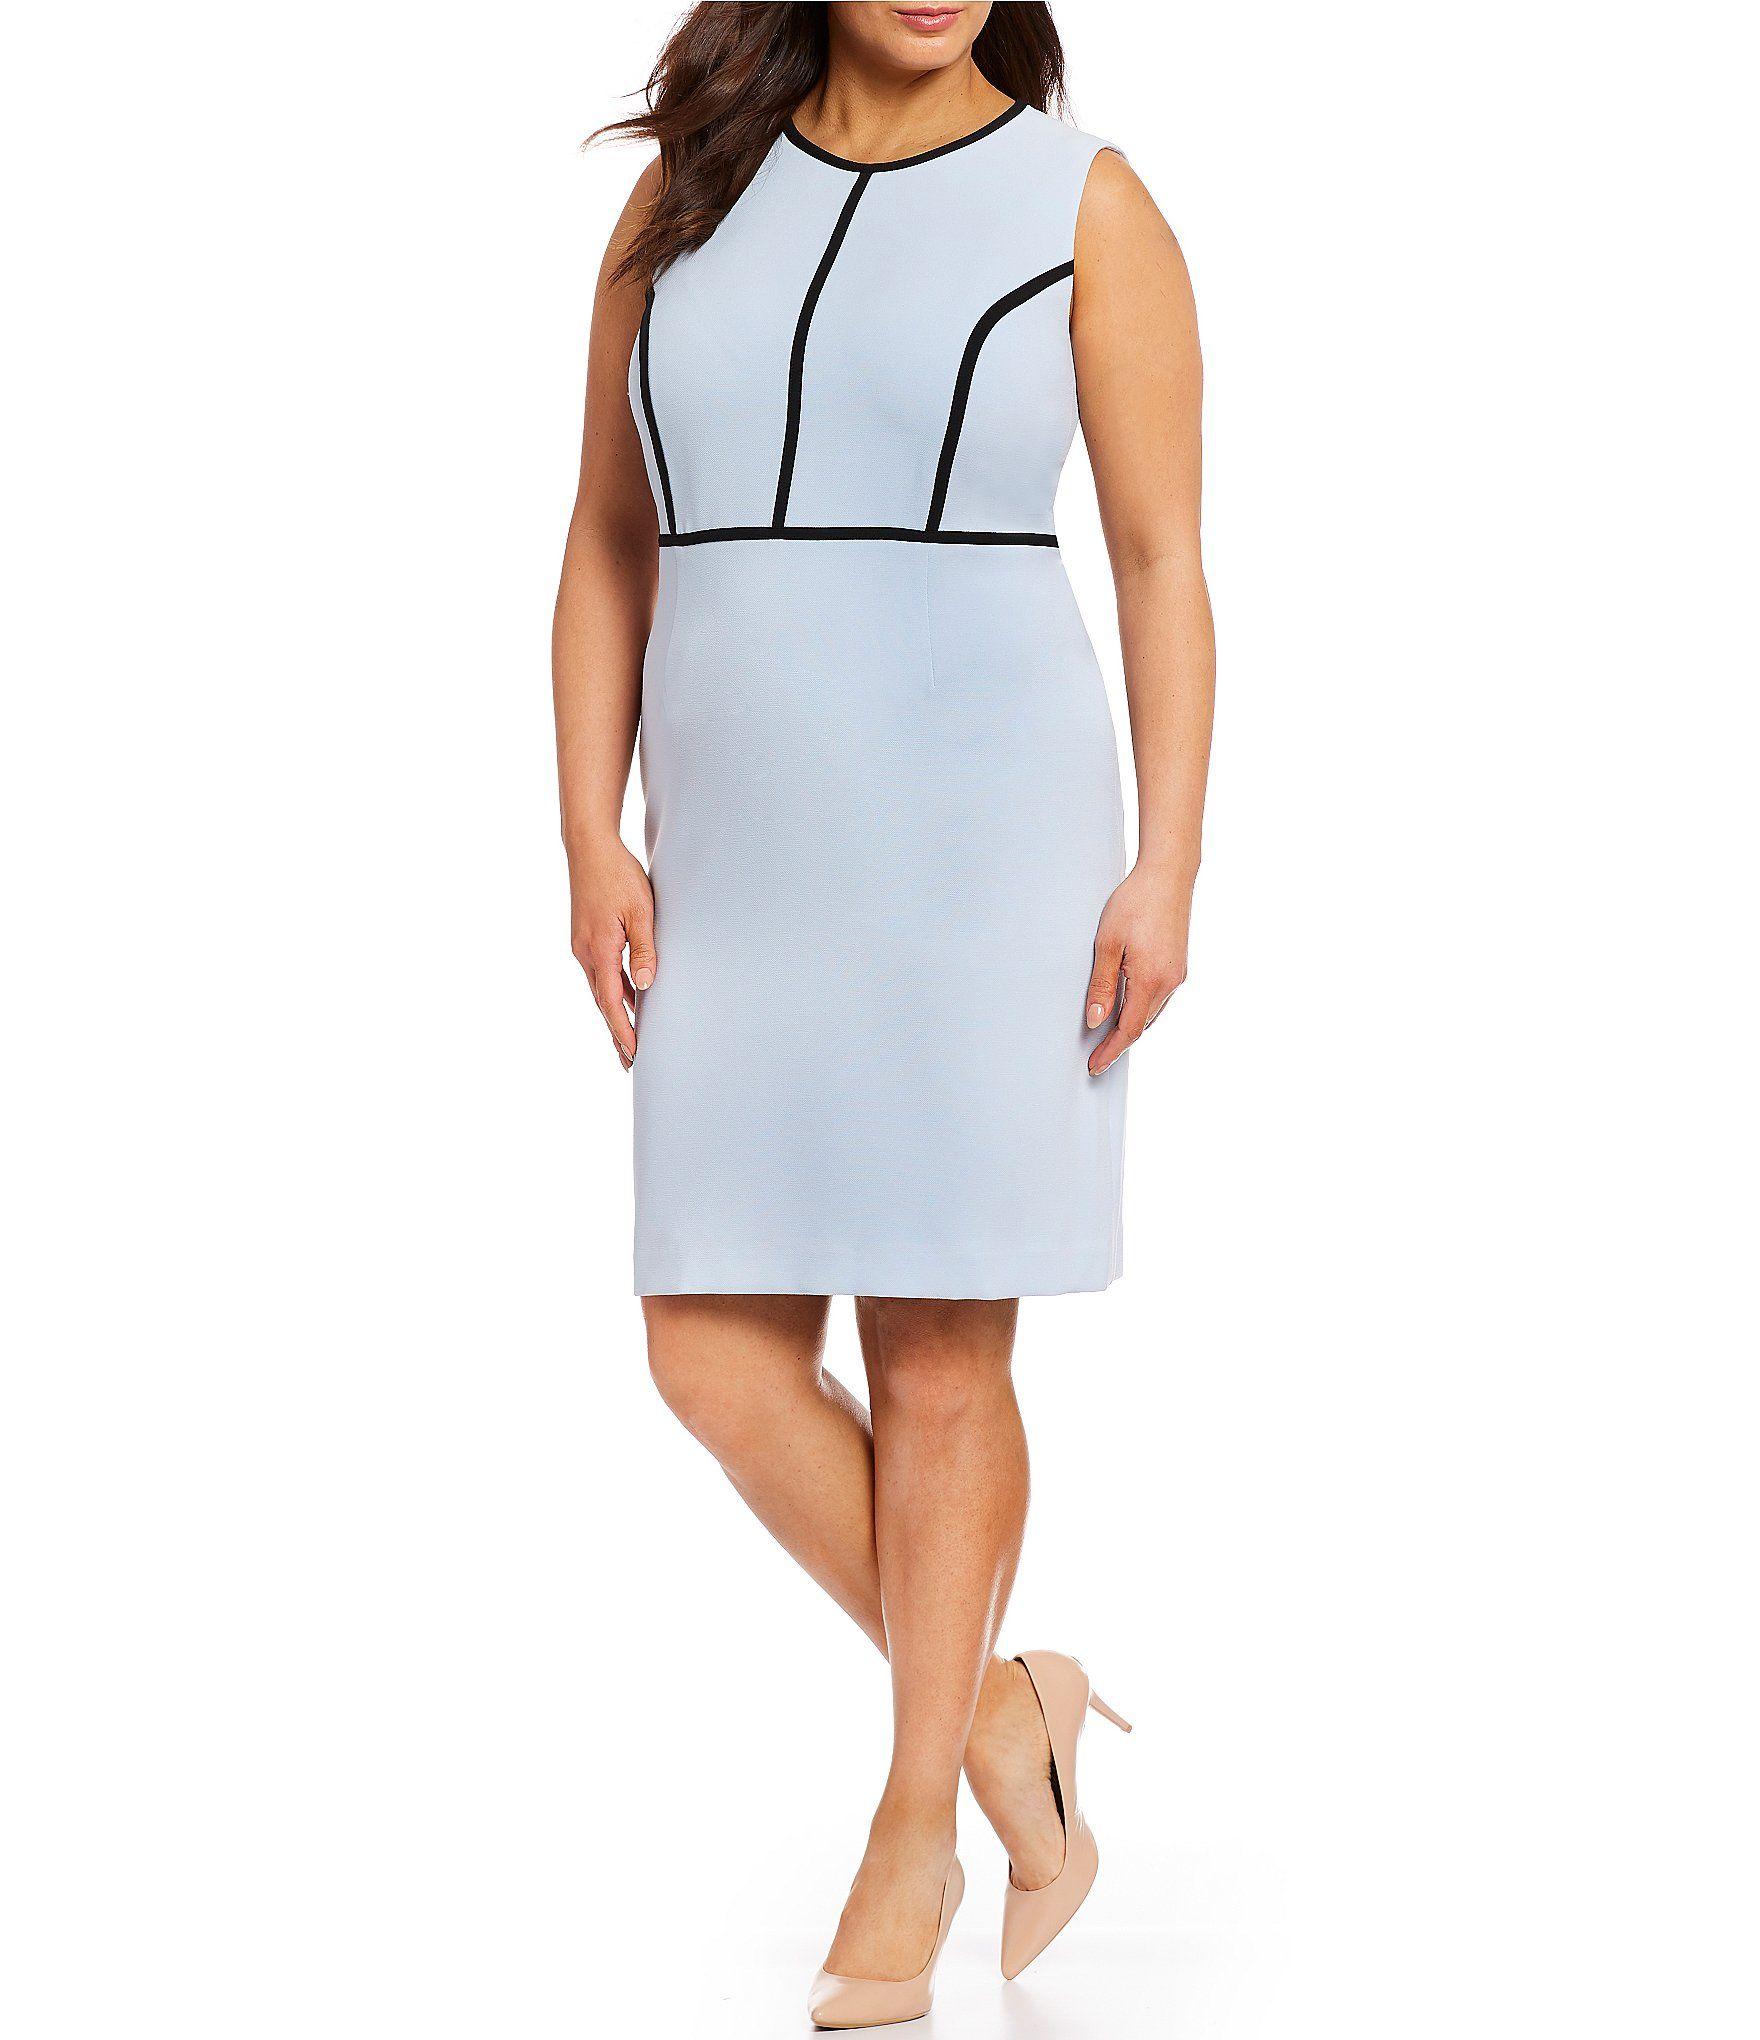 95ed94e975 Shop for Kasper Plus Size Crepe Contrast Pipping Sheath Dress at  Dillards.com. Visit